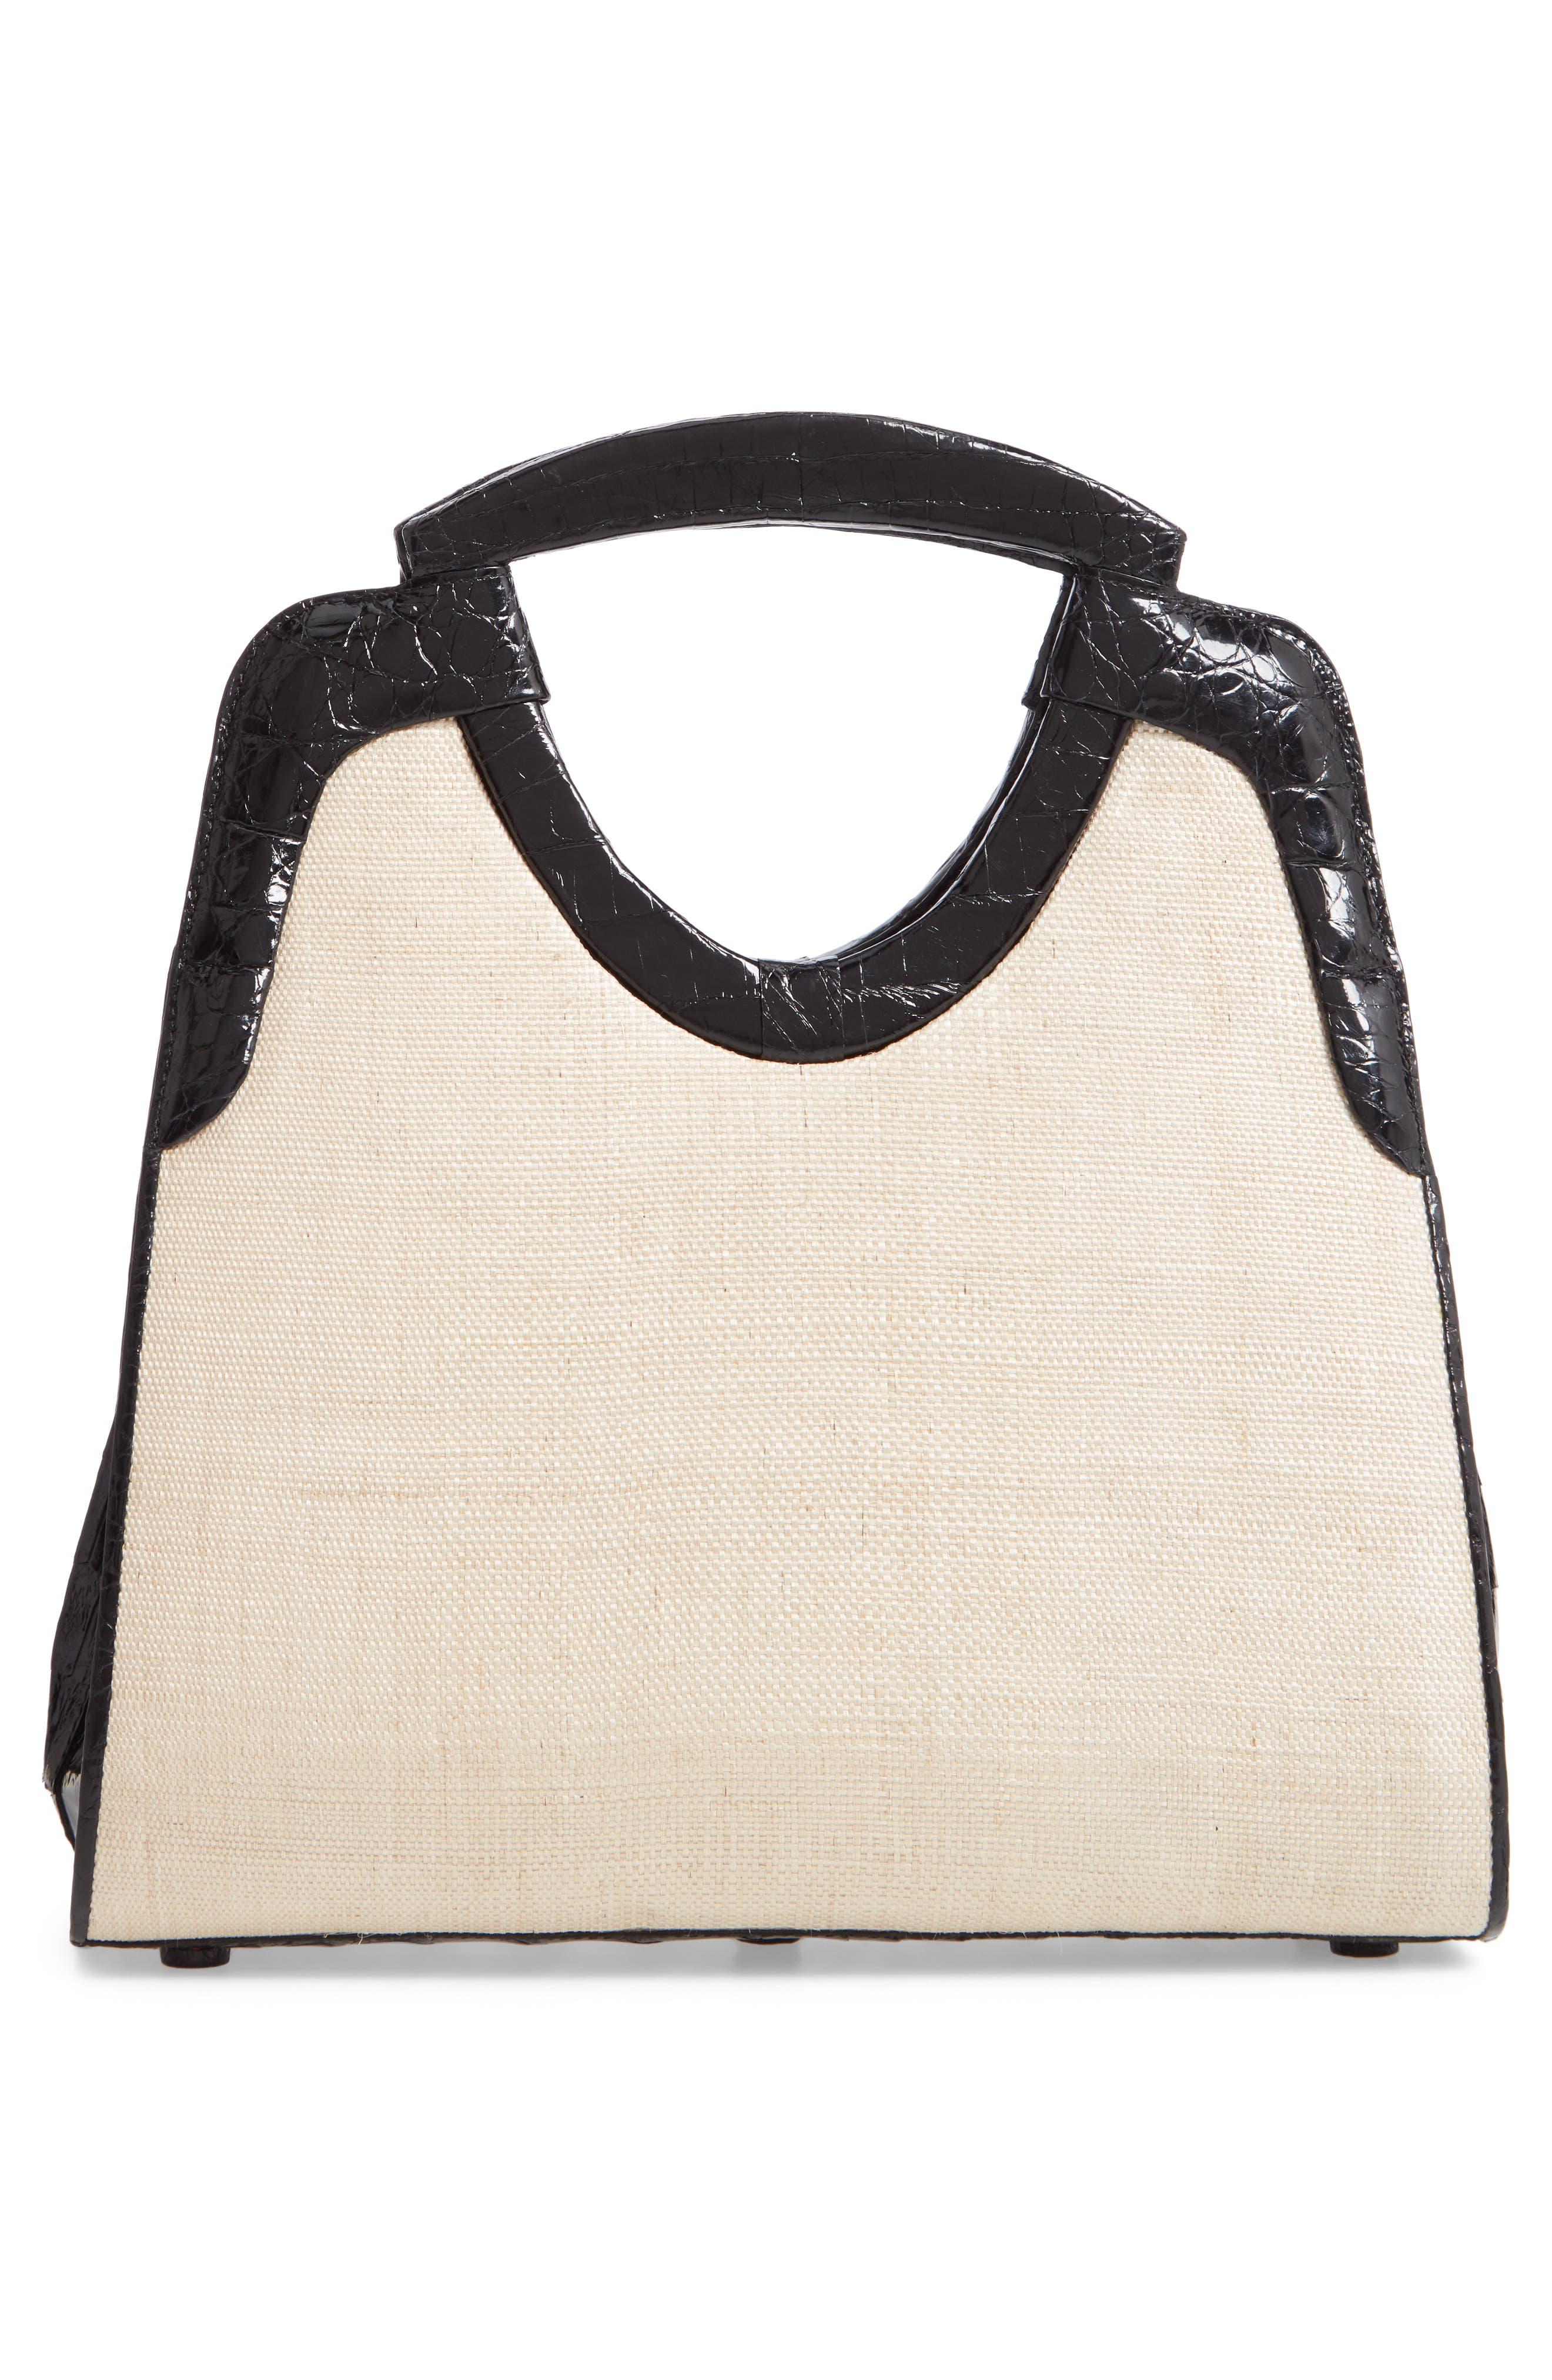 Small Genuine Crocodile Top Handle Bag,                             Alternate thumbnail 3, color,                             BLACK/ STRAW